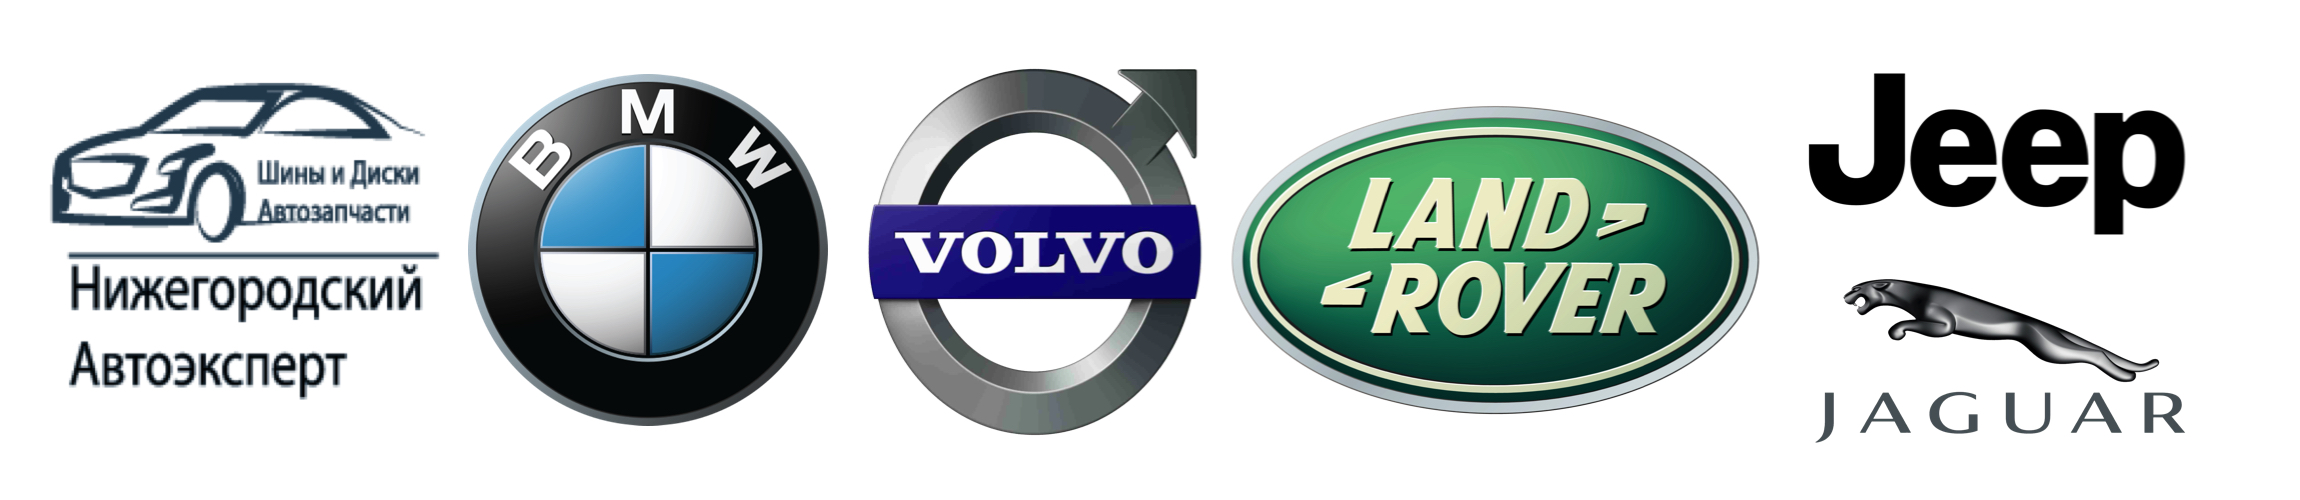 Нижегородский автоэксперт - запчасти для bmw, volvo, land rover, jeep, jaguar